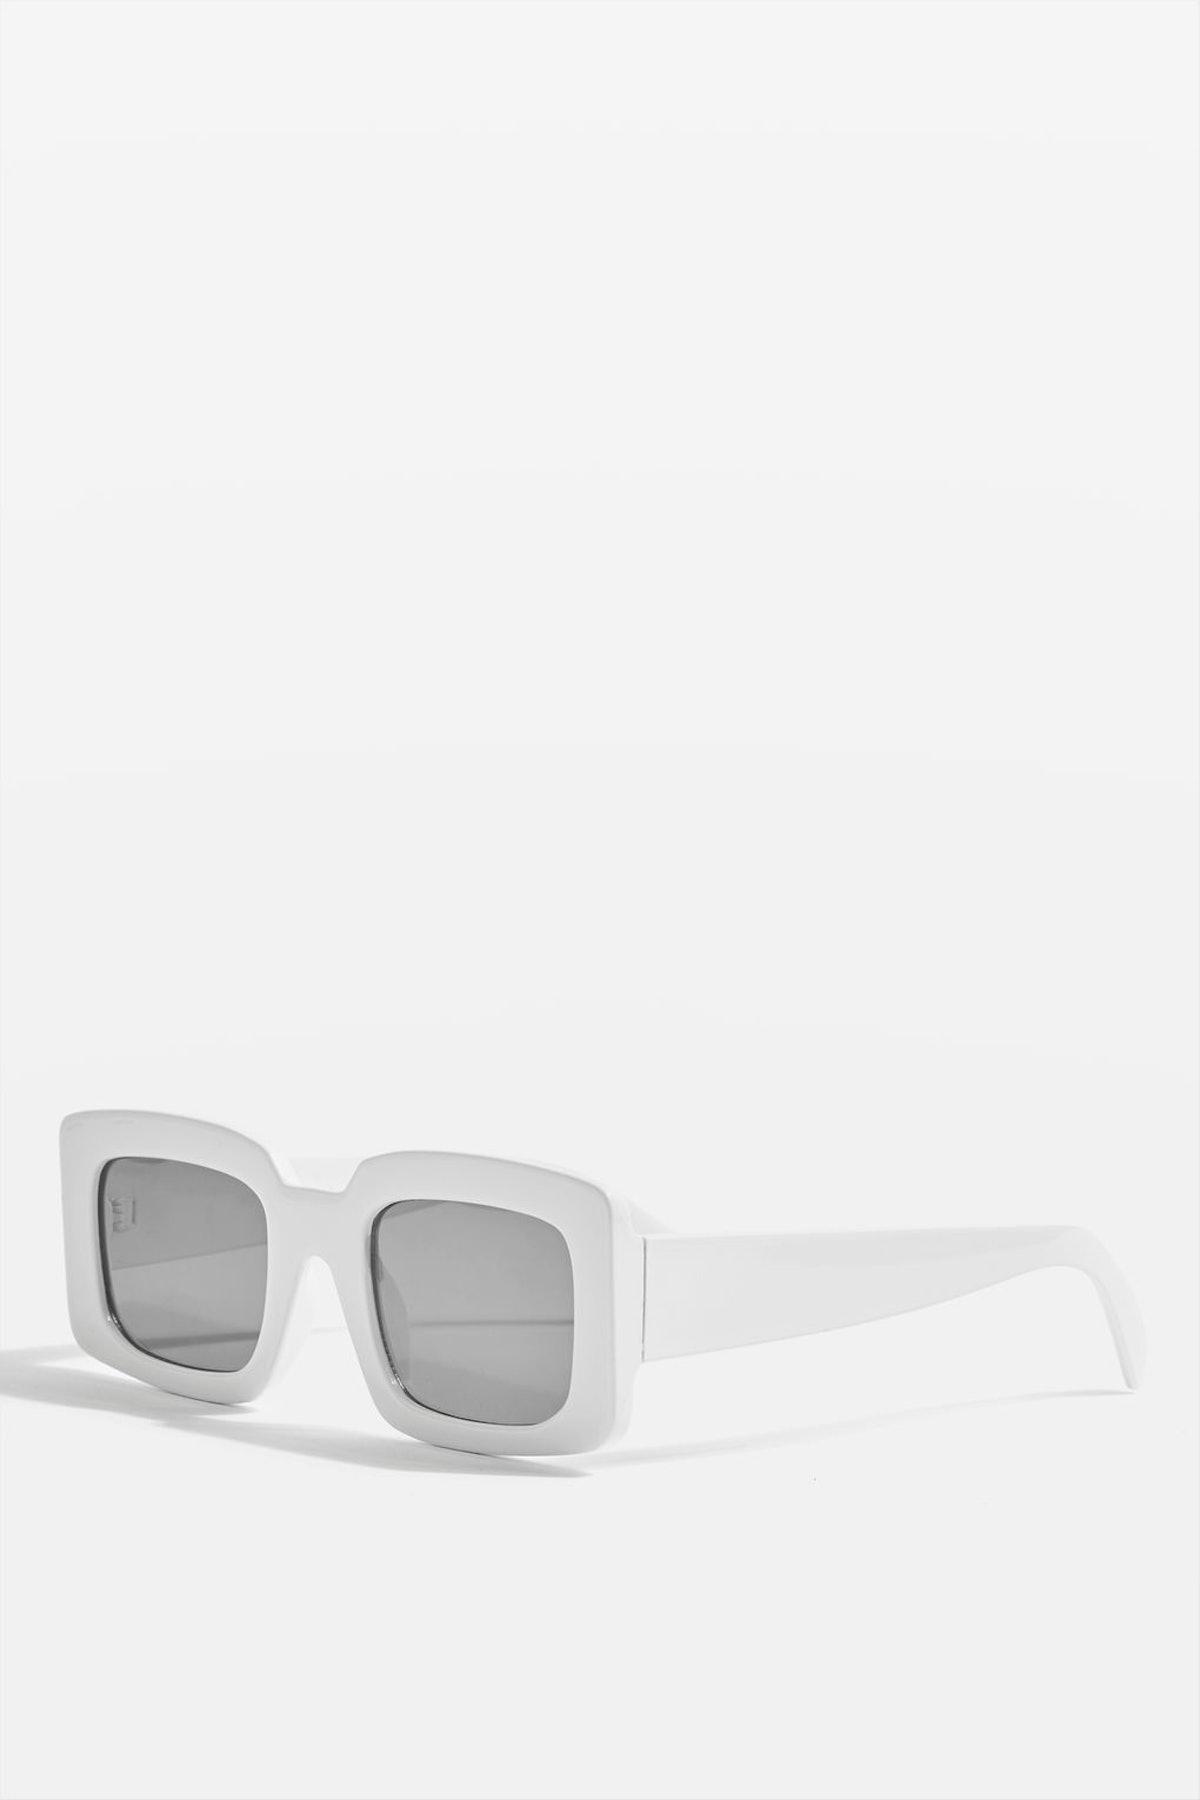 Willis Chunky Frame Sunglasses